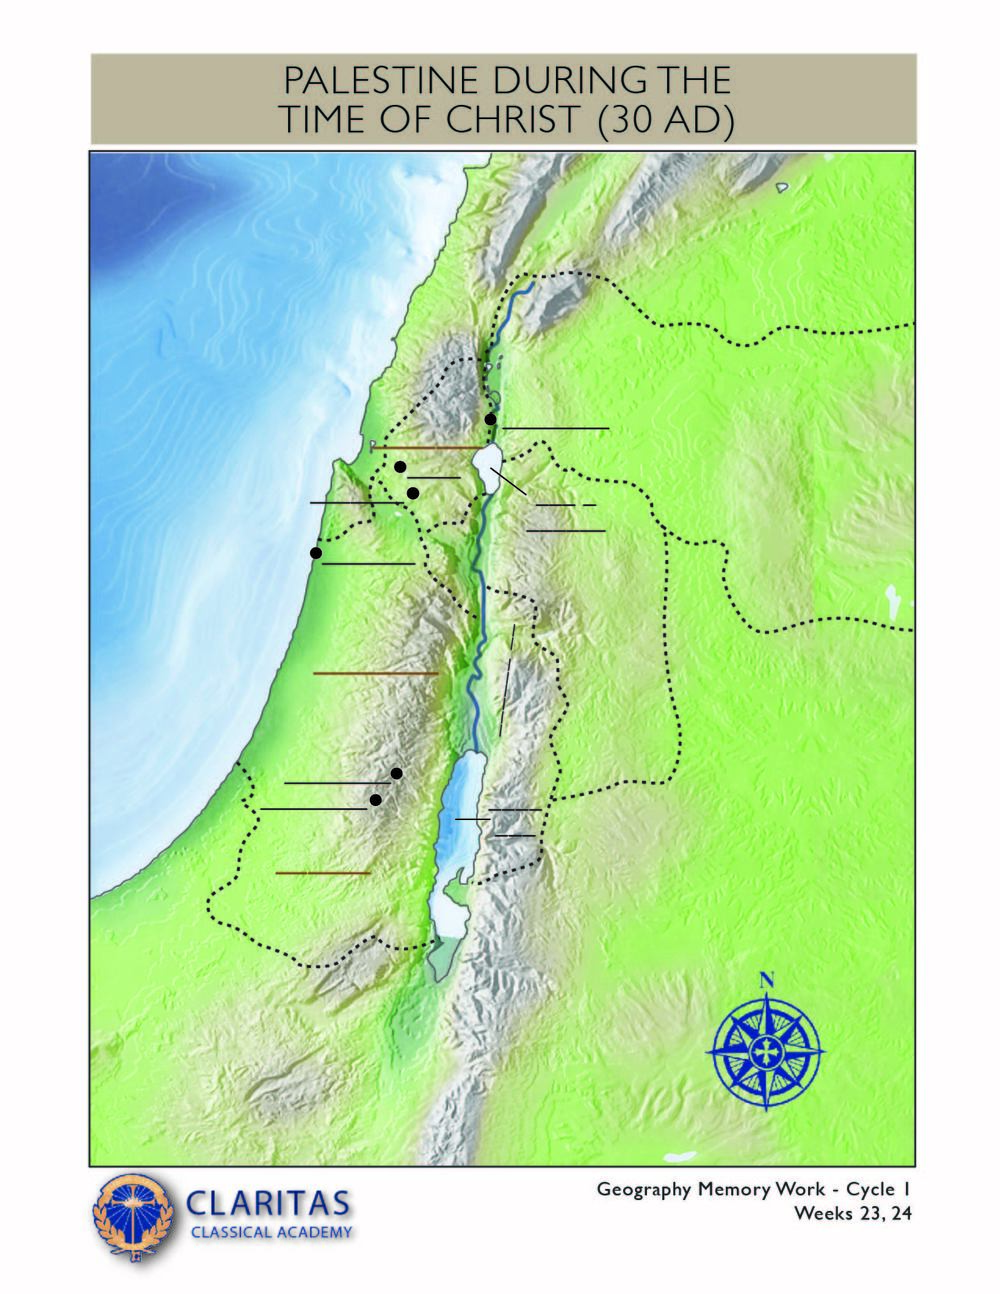 Cyc1_Palestine STU.jpg